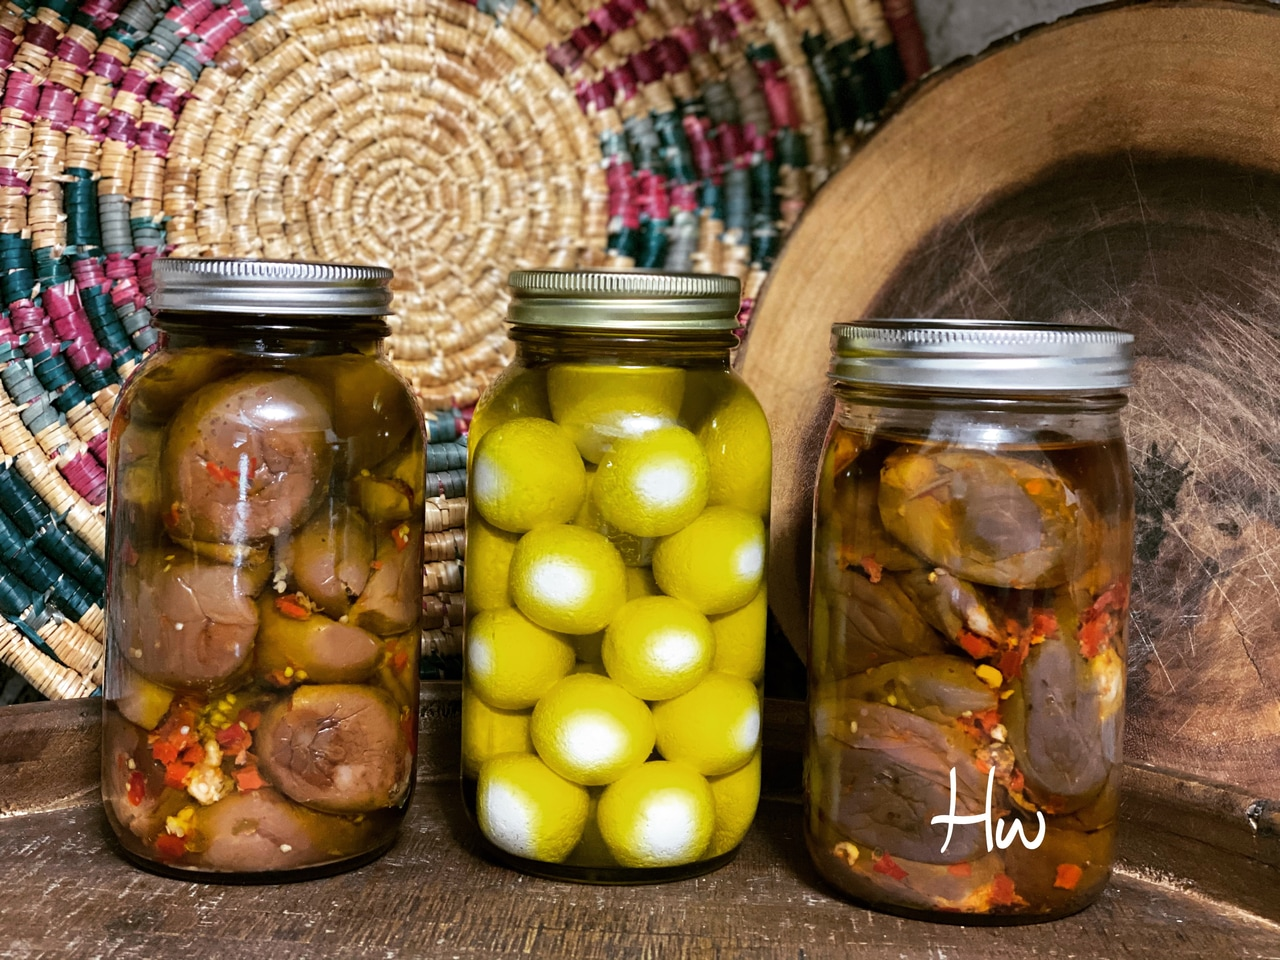 homemade, رَمَضَان, and سحور image